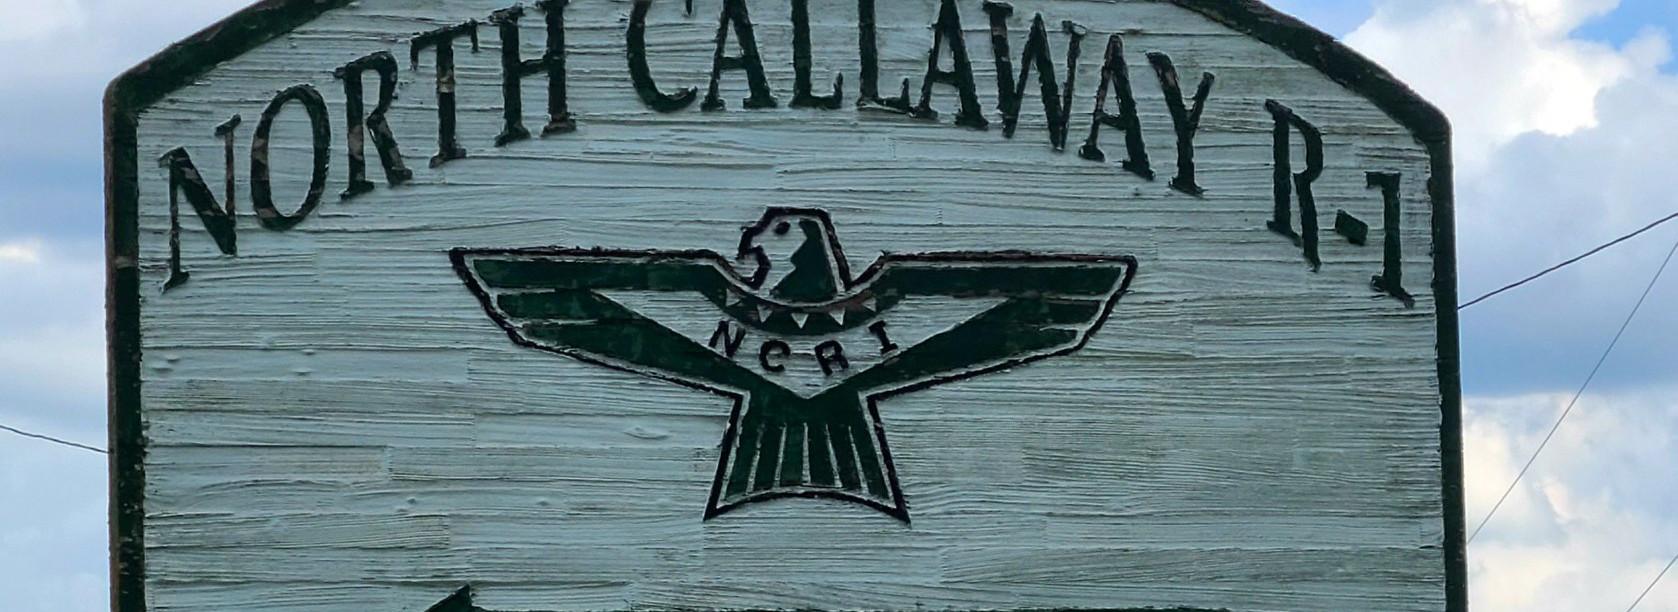 North Callaway R1 photo.jpg